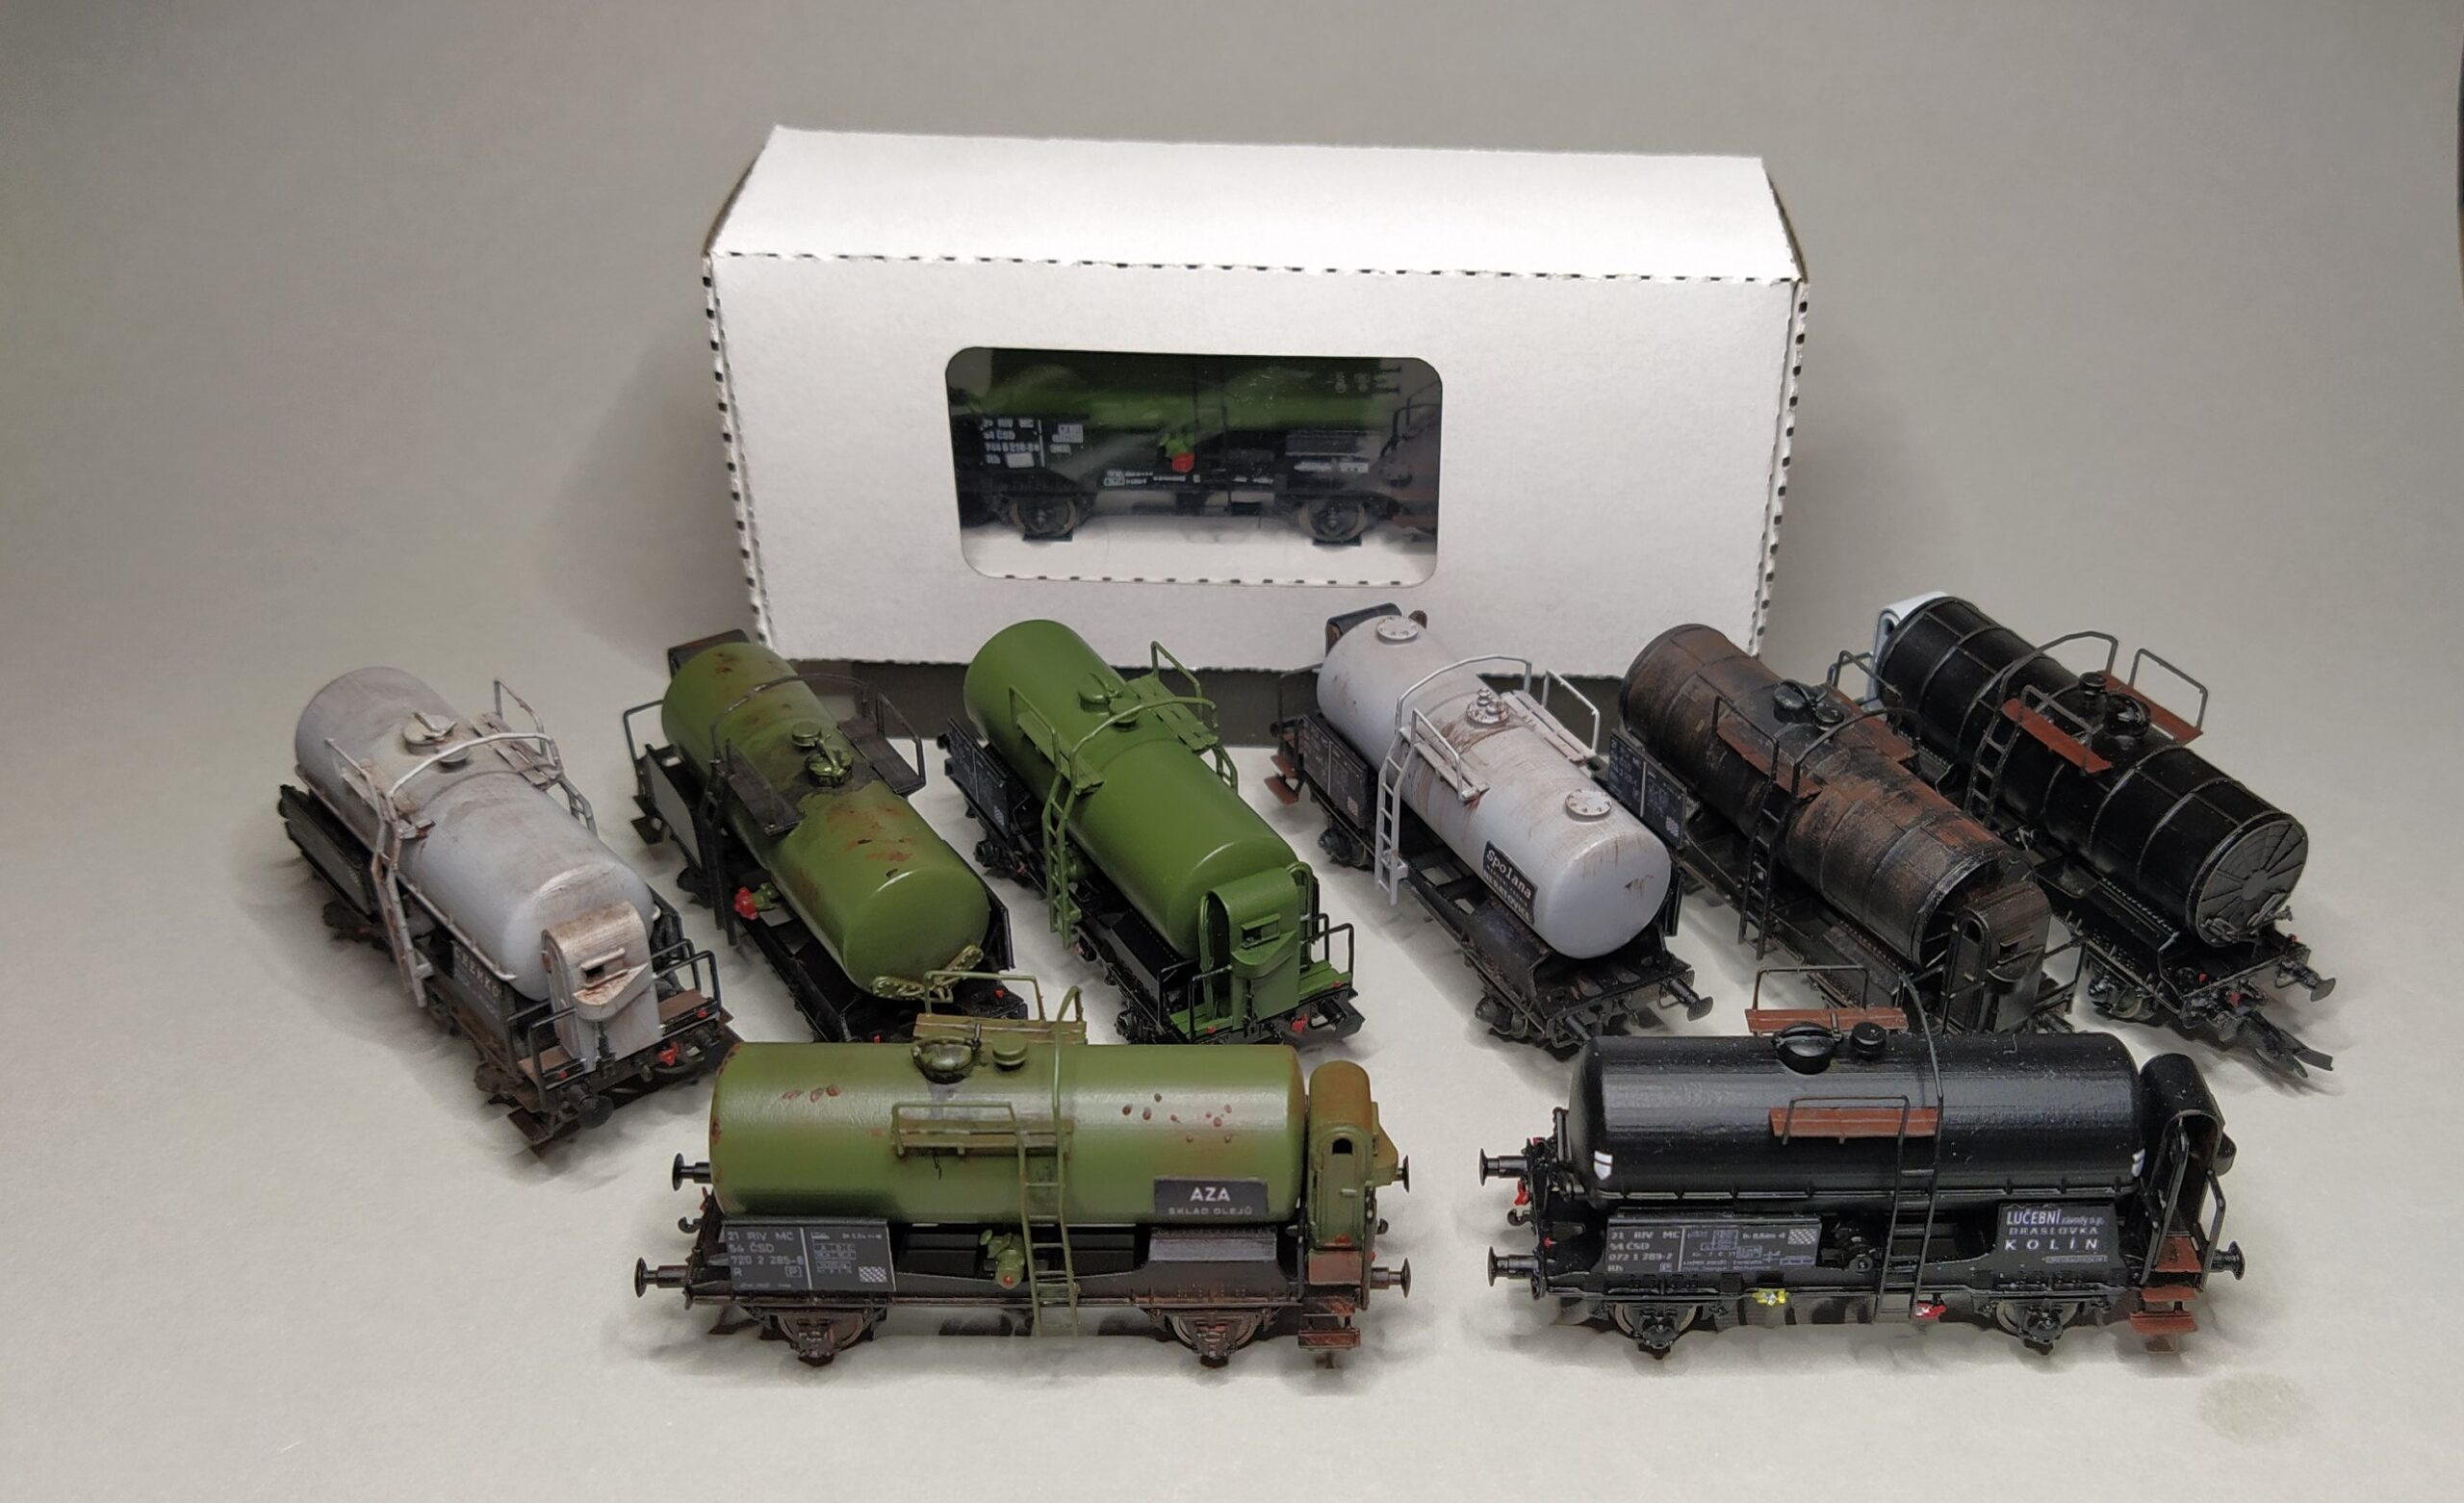 Modely TT kotlové vozy